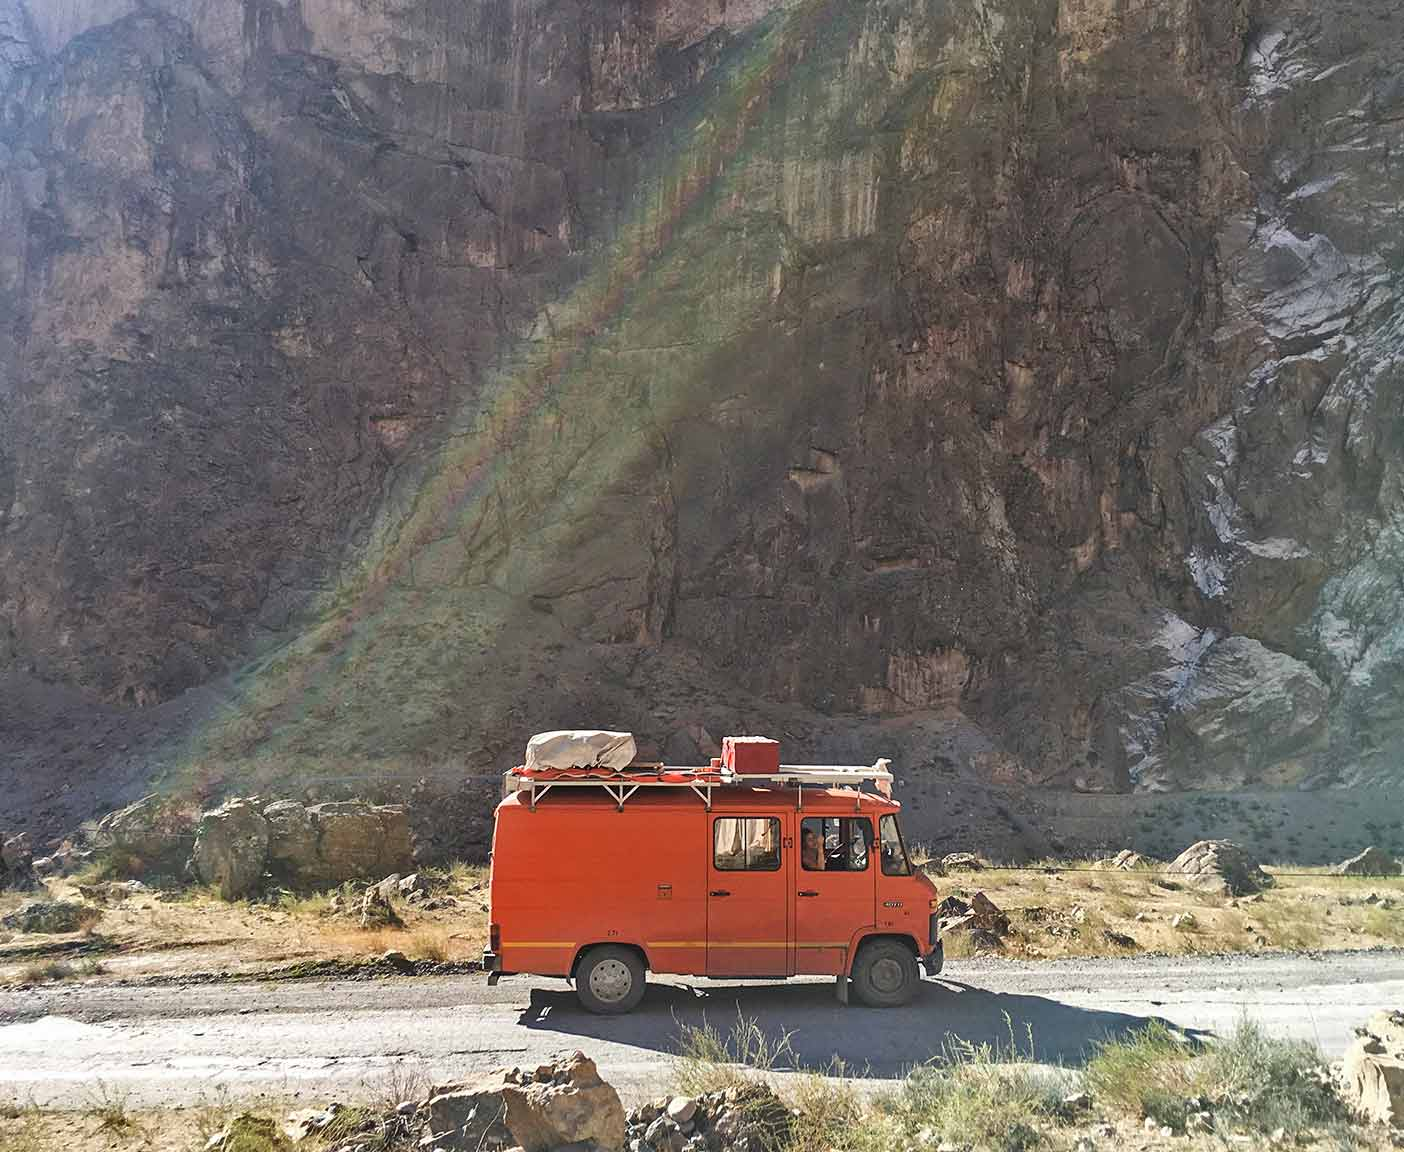 pamir-highway-m41-motorrad-auto-wohnmobil-camper-laenge-kyrgyzstan-guide-2017-2018-2019-china-afghanistan